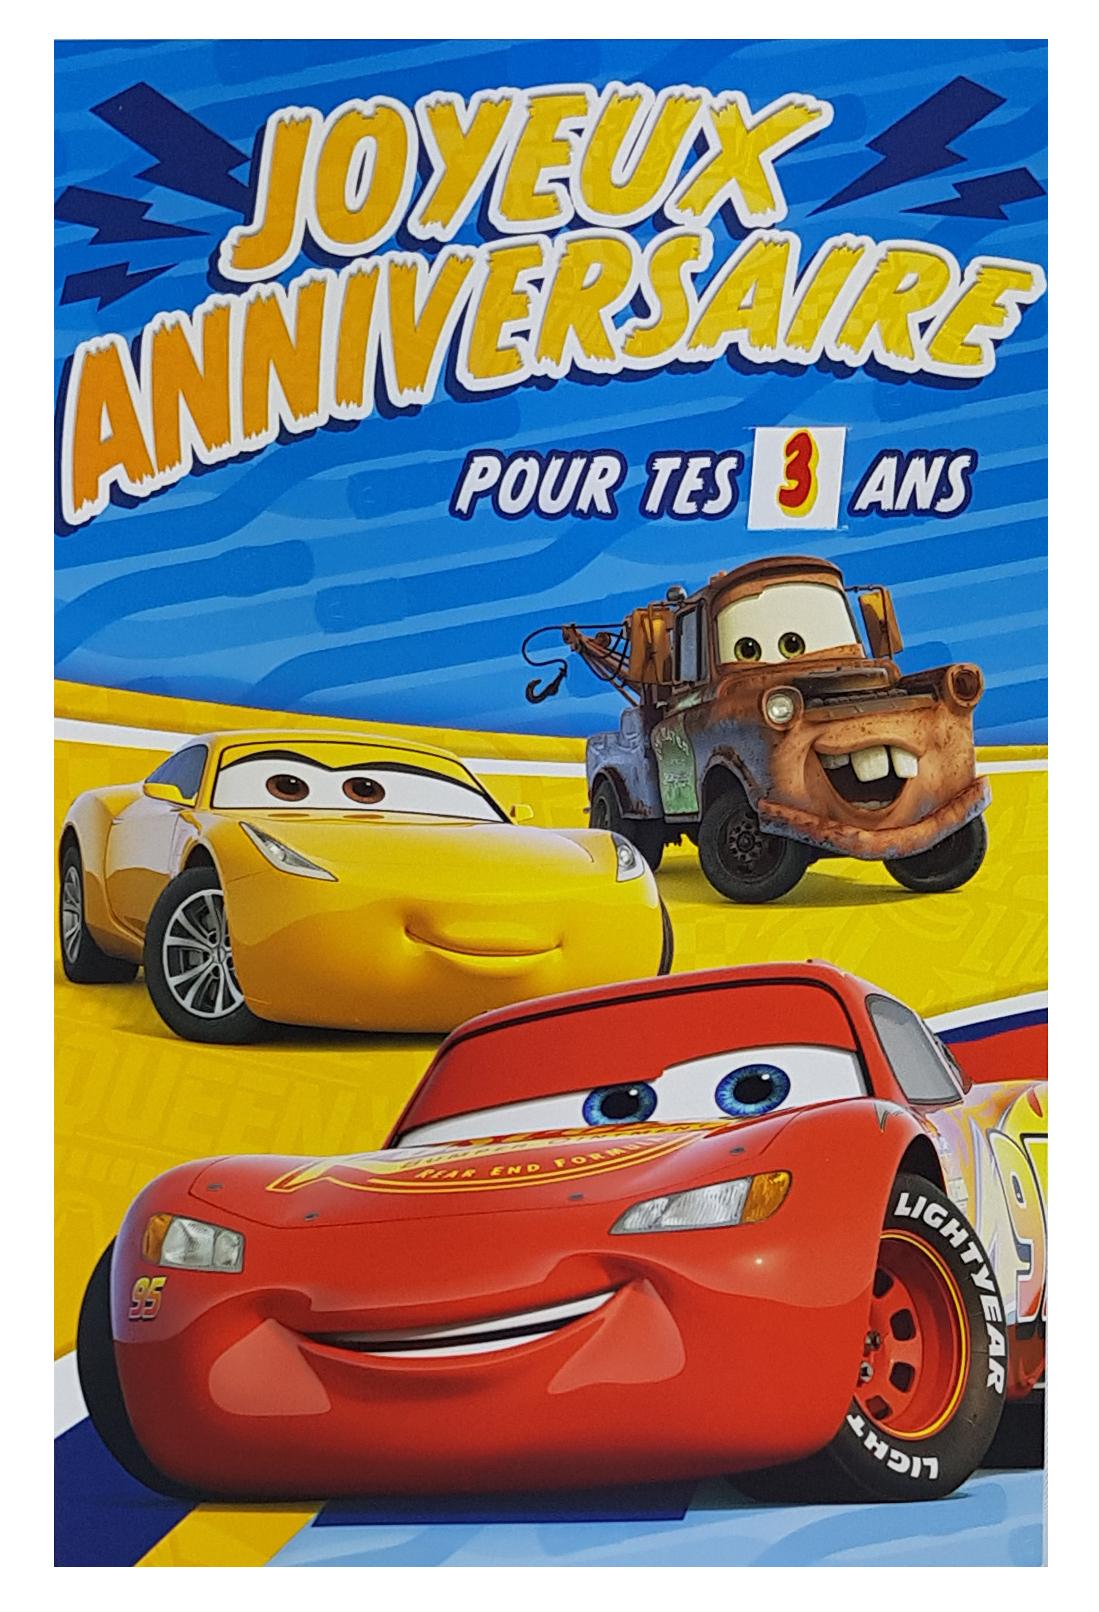 Carte de menu anniversaire Cars Disney Pixar-Martin, Cruz et Flash McQueen. Réf. 78